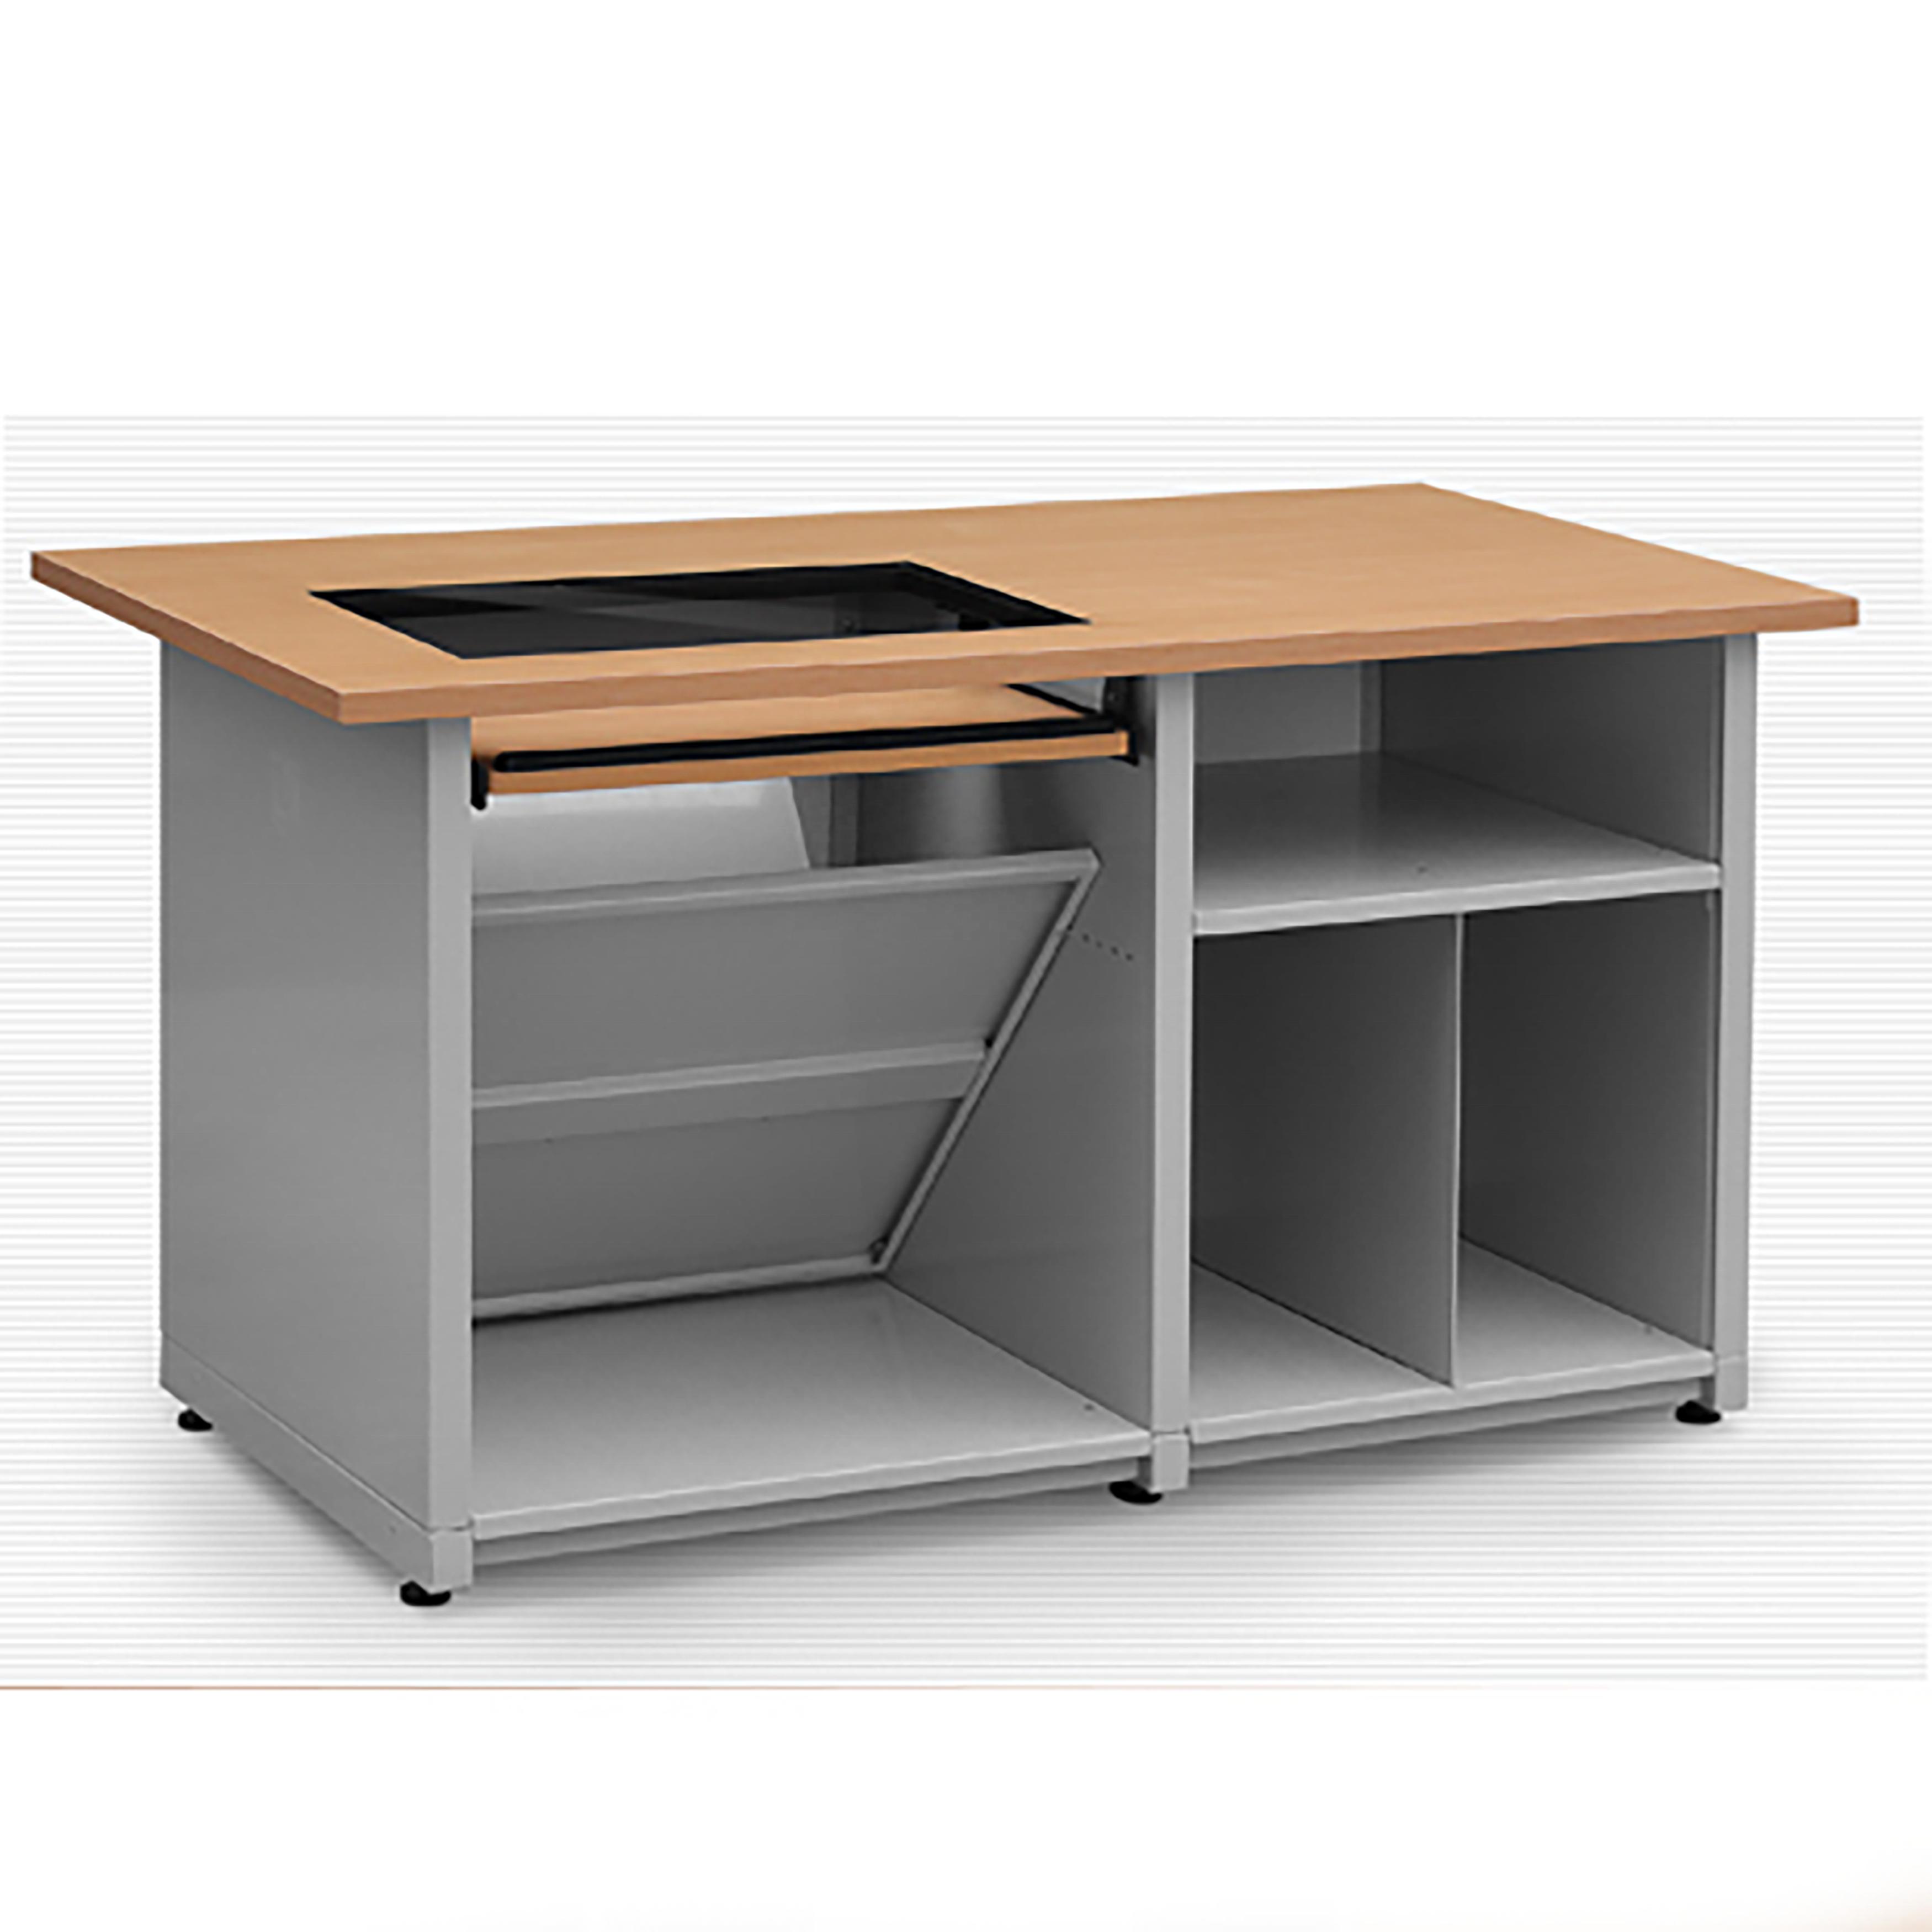 Modern Design Computer Desk Material Steel Sheet Glass Wood Mdf For Office Furniture Buy Computer Desk Office Table Office Computer Desk Product On Alibaba Com